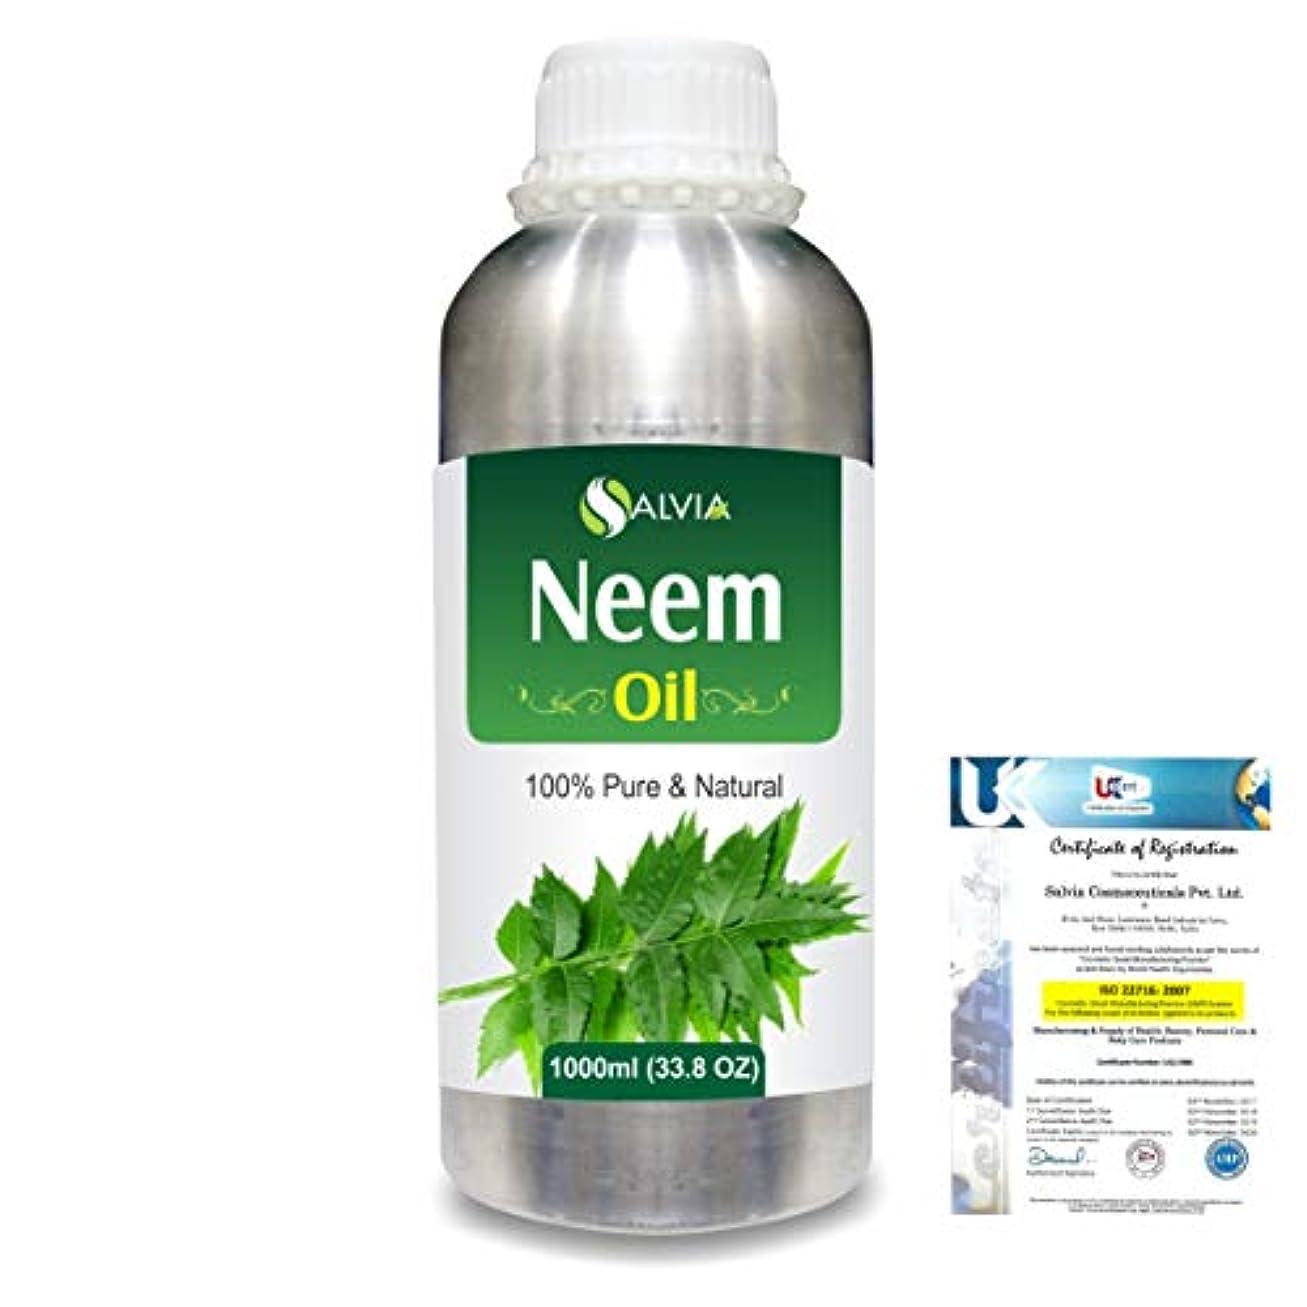 Neem (Azadirachta indica) 100% Natural Pure Essential Oil 1000ml/33.8fl.oz.